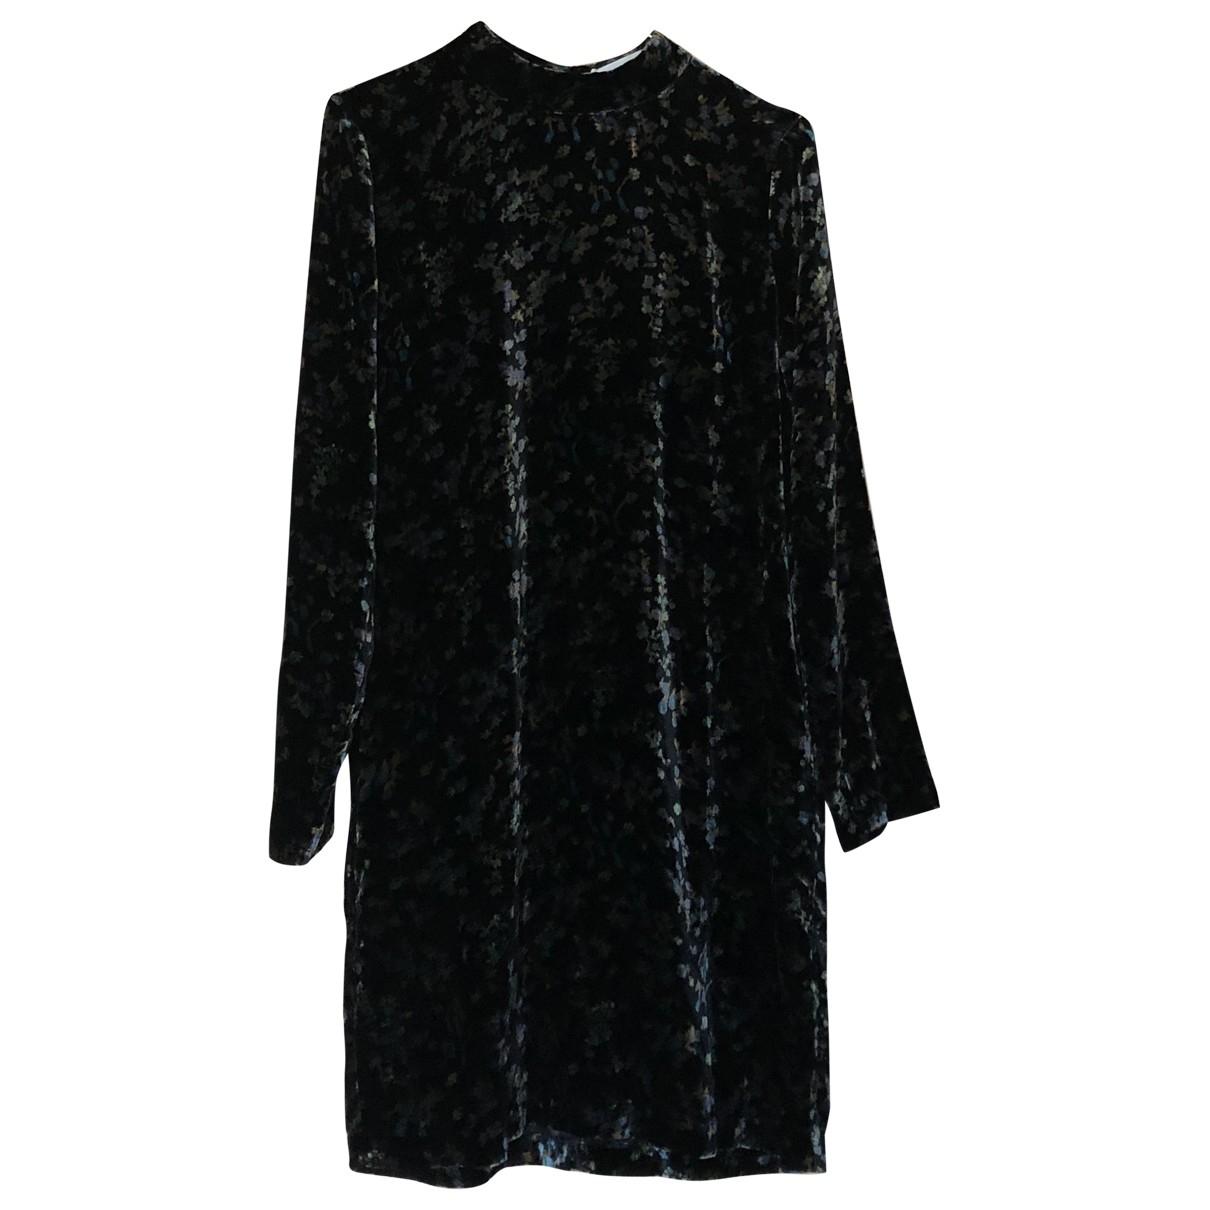 Samsoe & Samsoe - Robe   pour femme en velours - multicolore